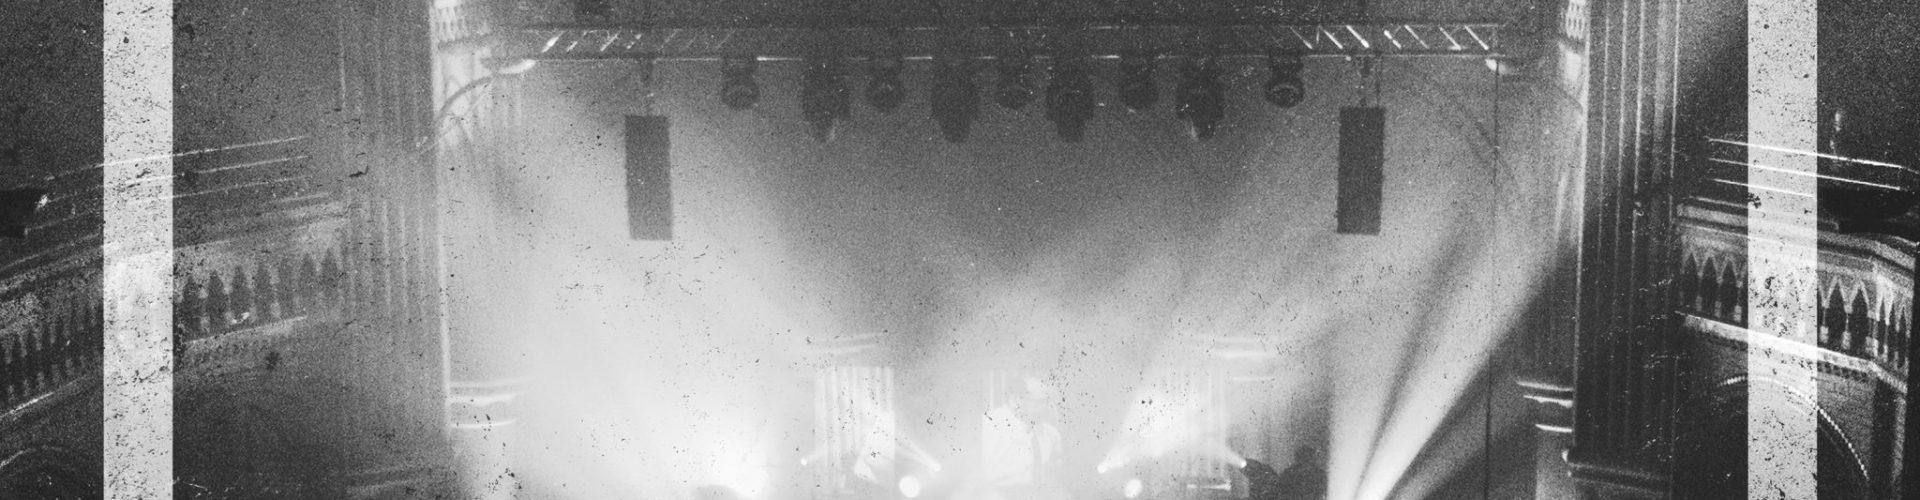 Metal-Review: LONG DISTANCE CALLING – STUMMFILM (LIVE FROM HAMBURG)